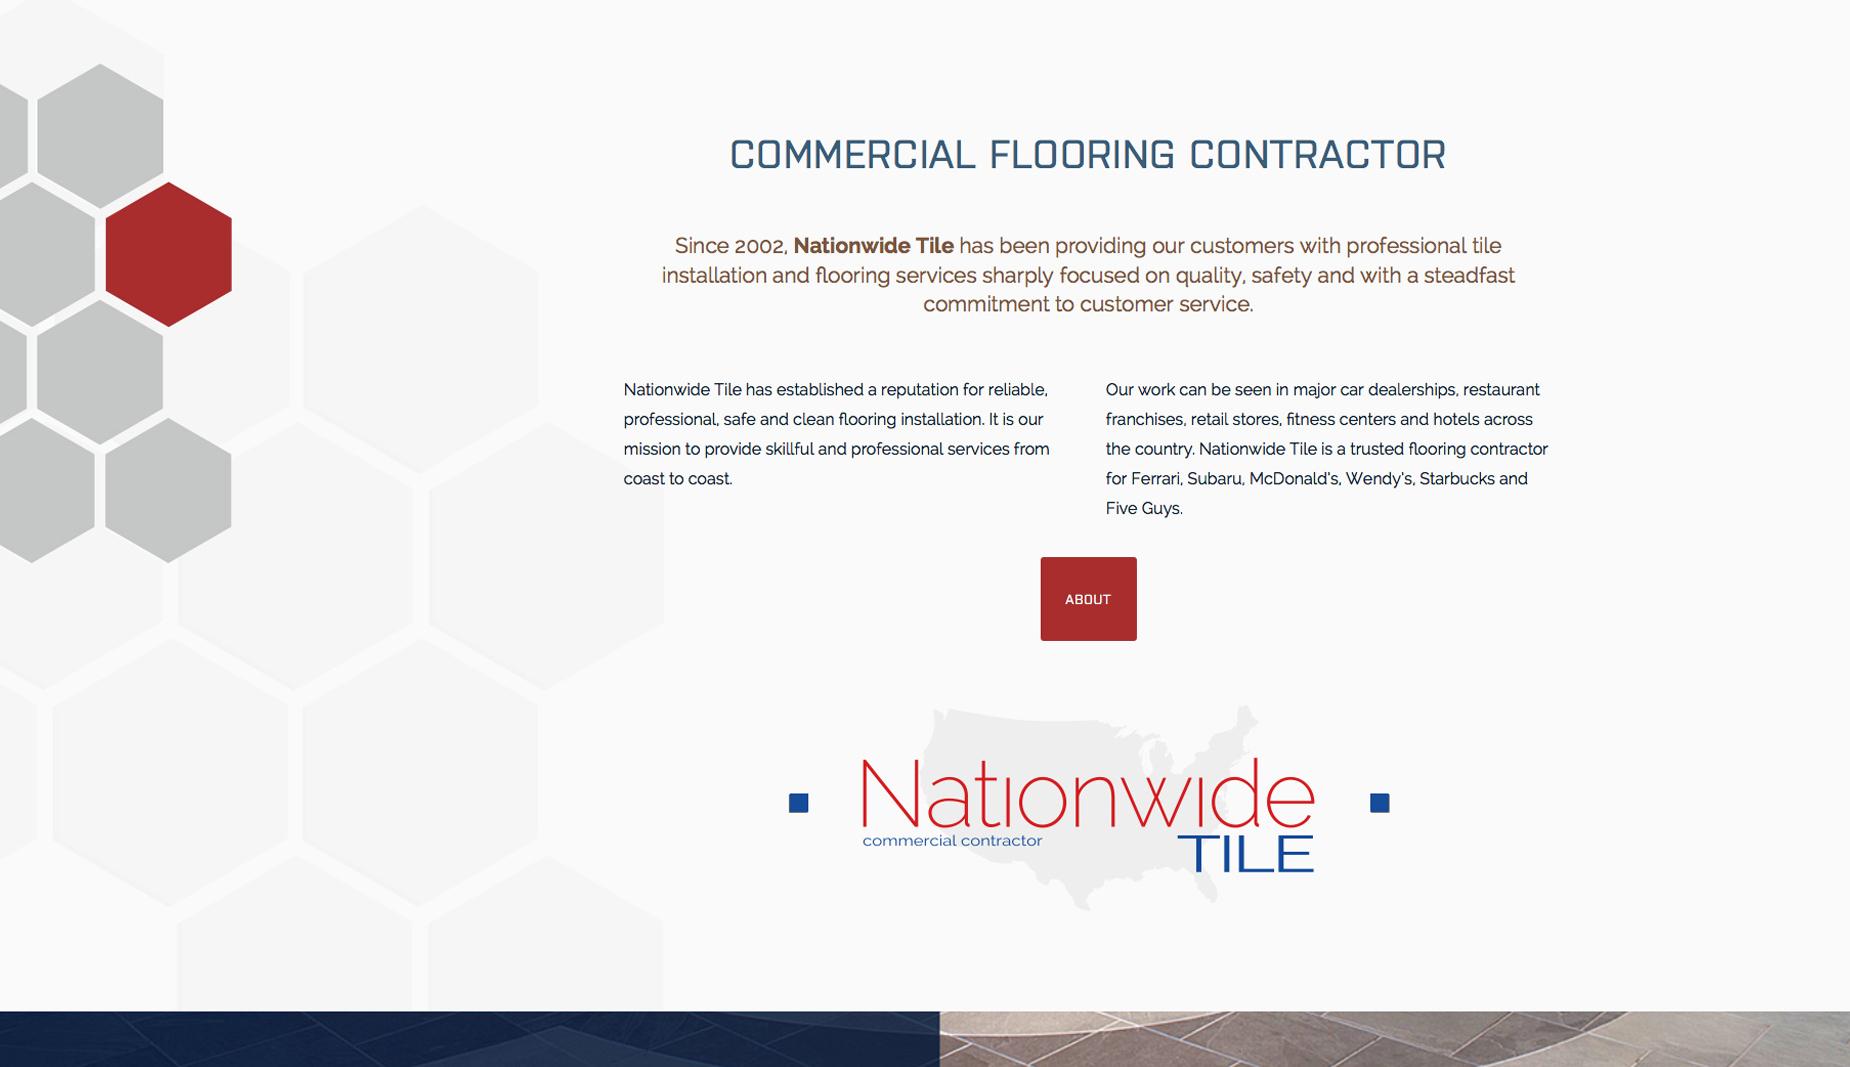 NATIONWIDE TILE - flooring